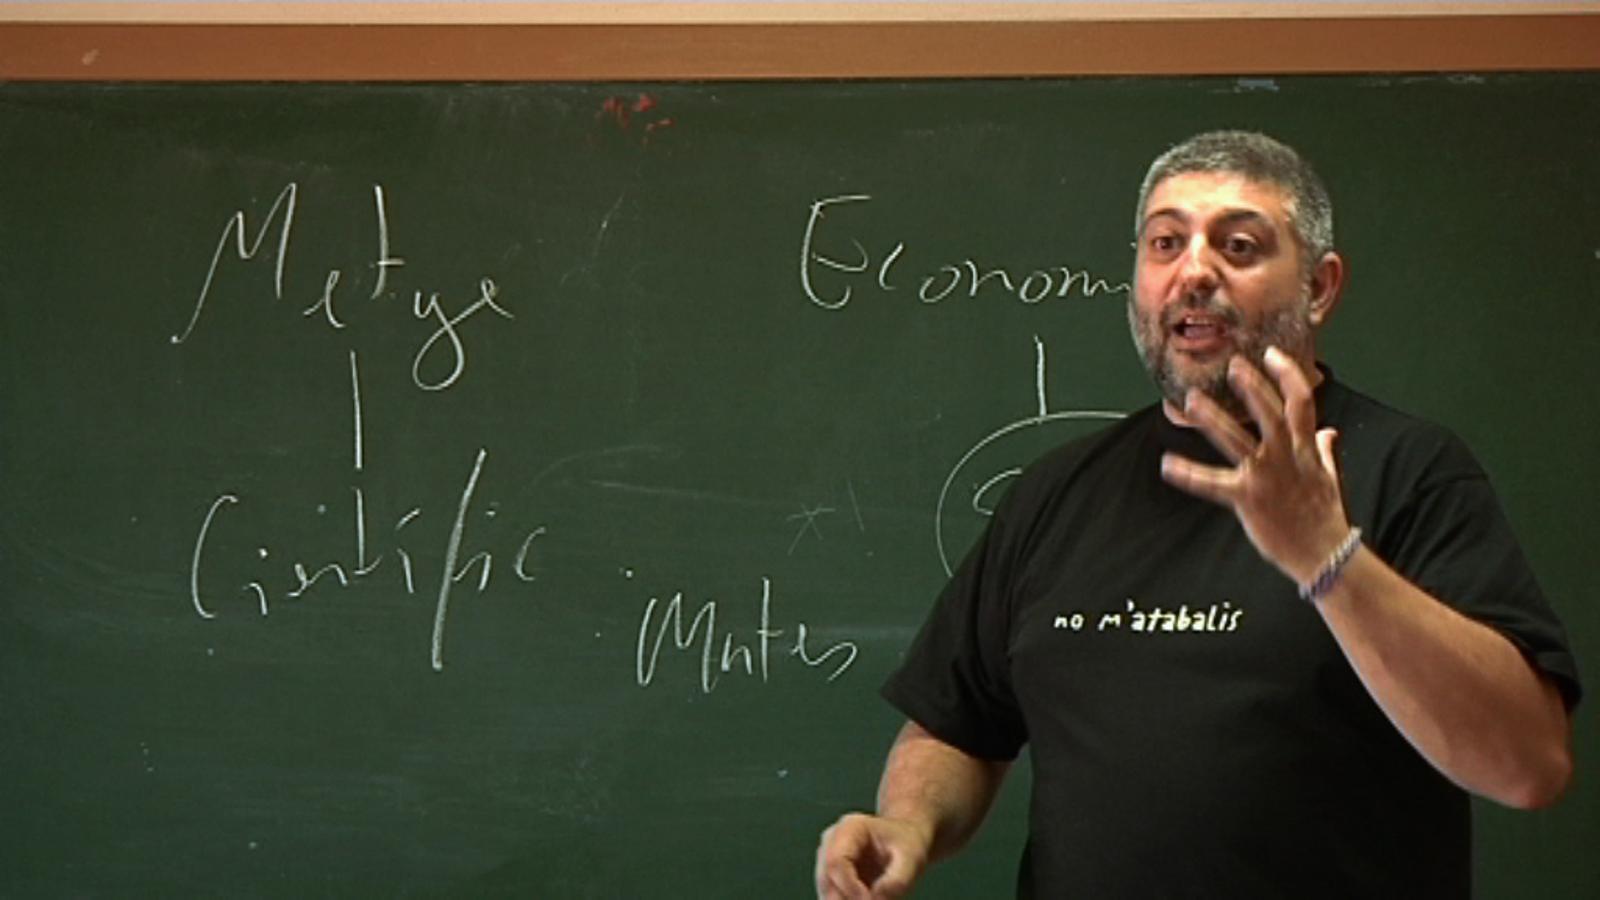 ARA Mestres: El tutor ha d'orientar, ajudar i acompanyar